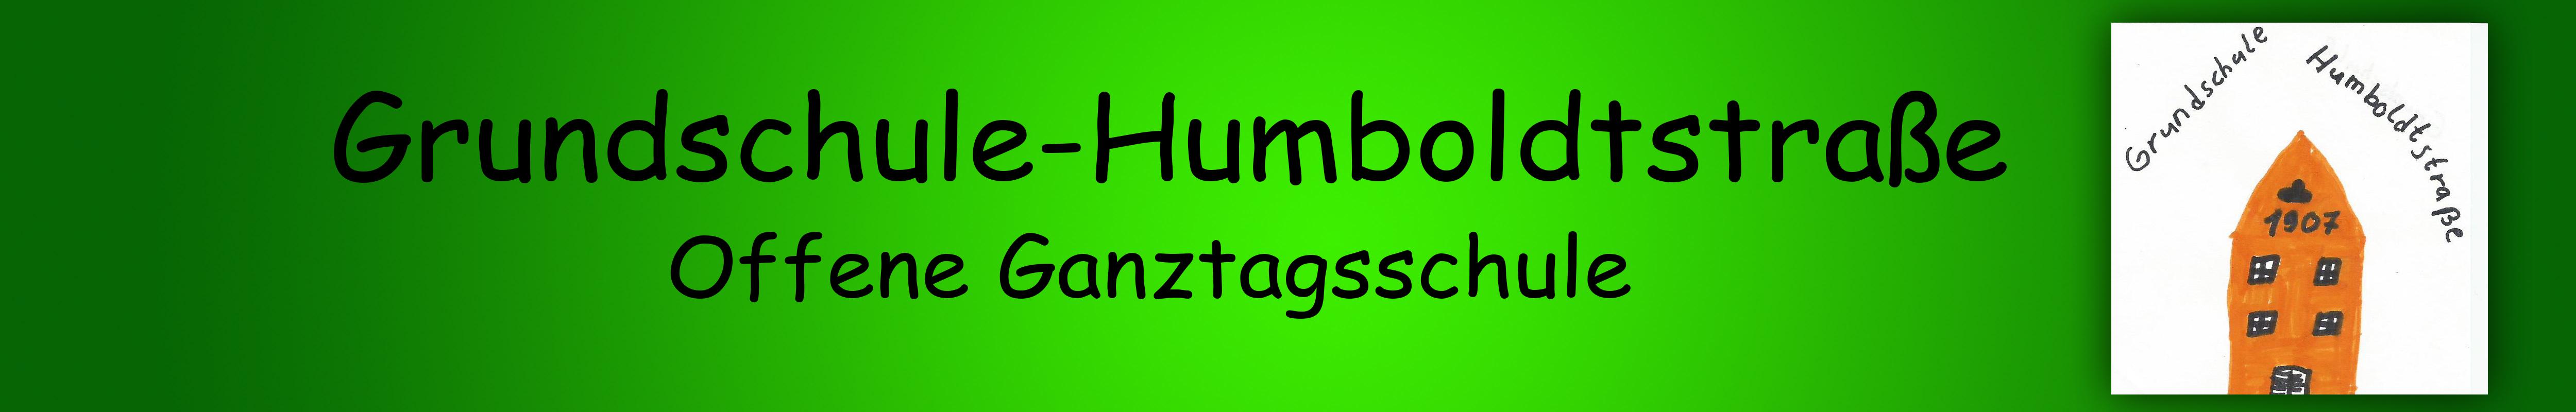 Grundschule-Humboldtstrasse